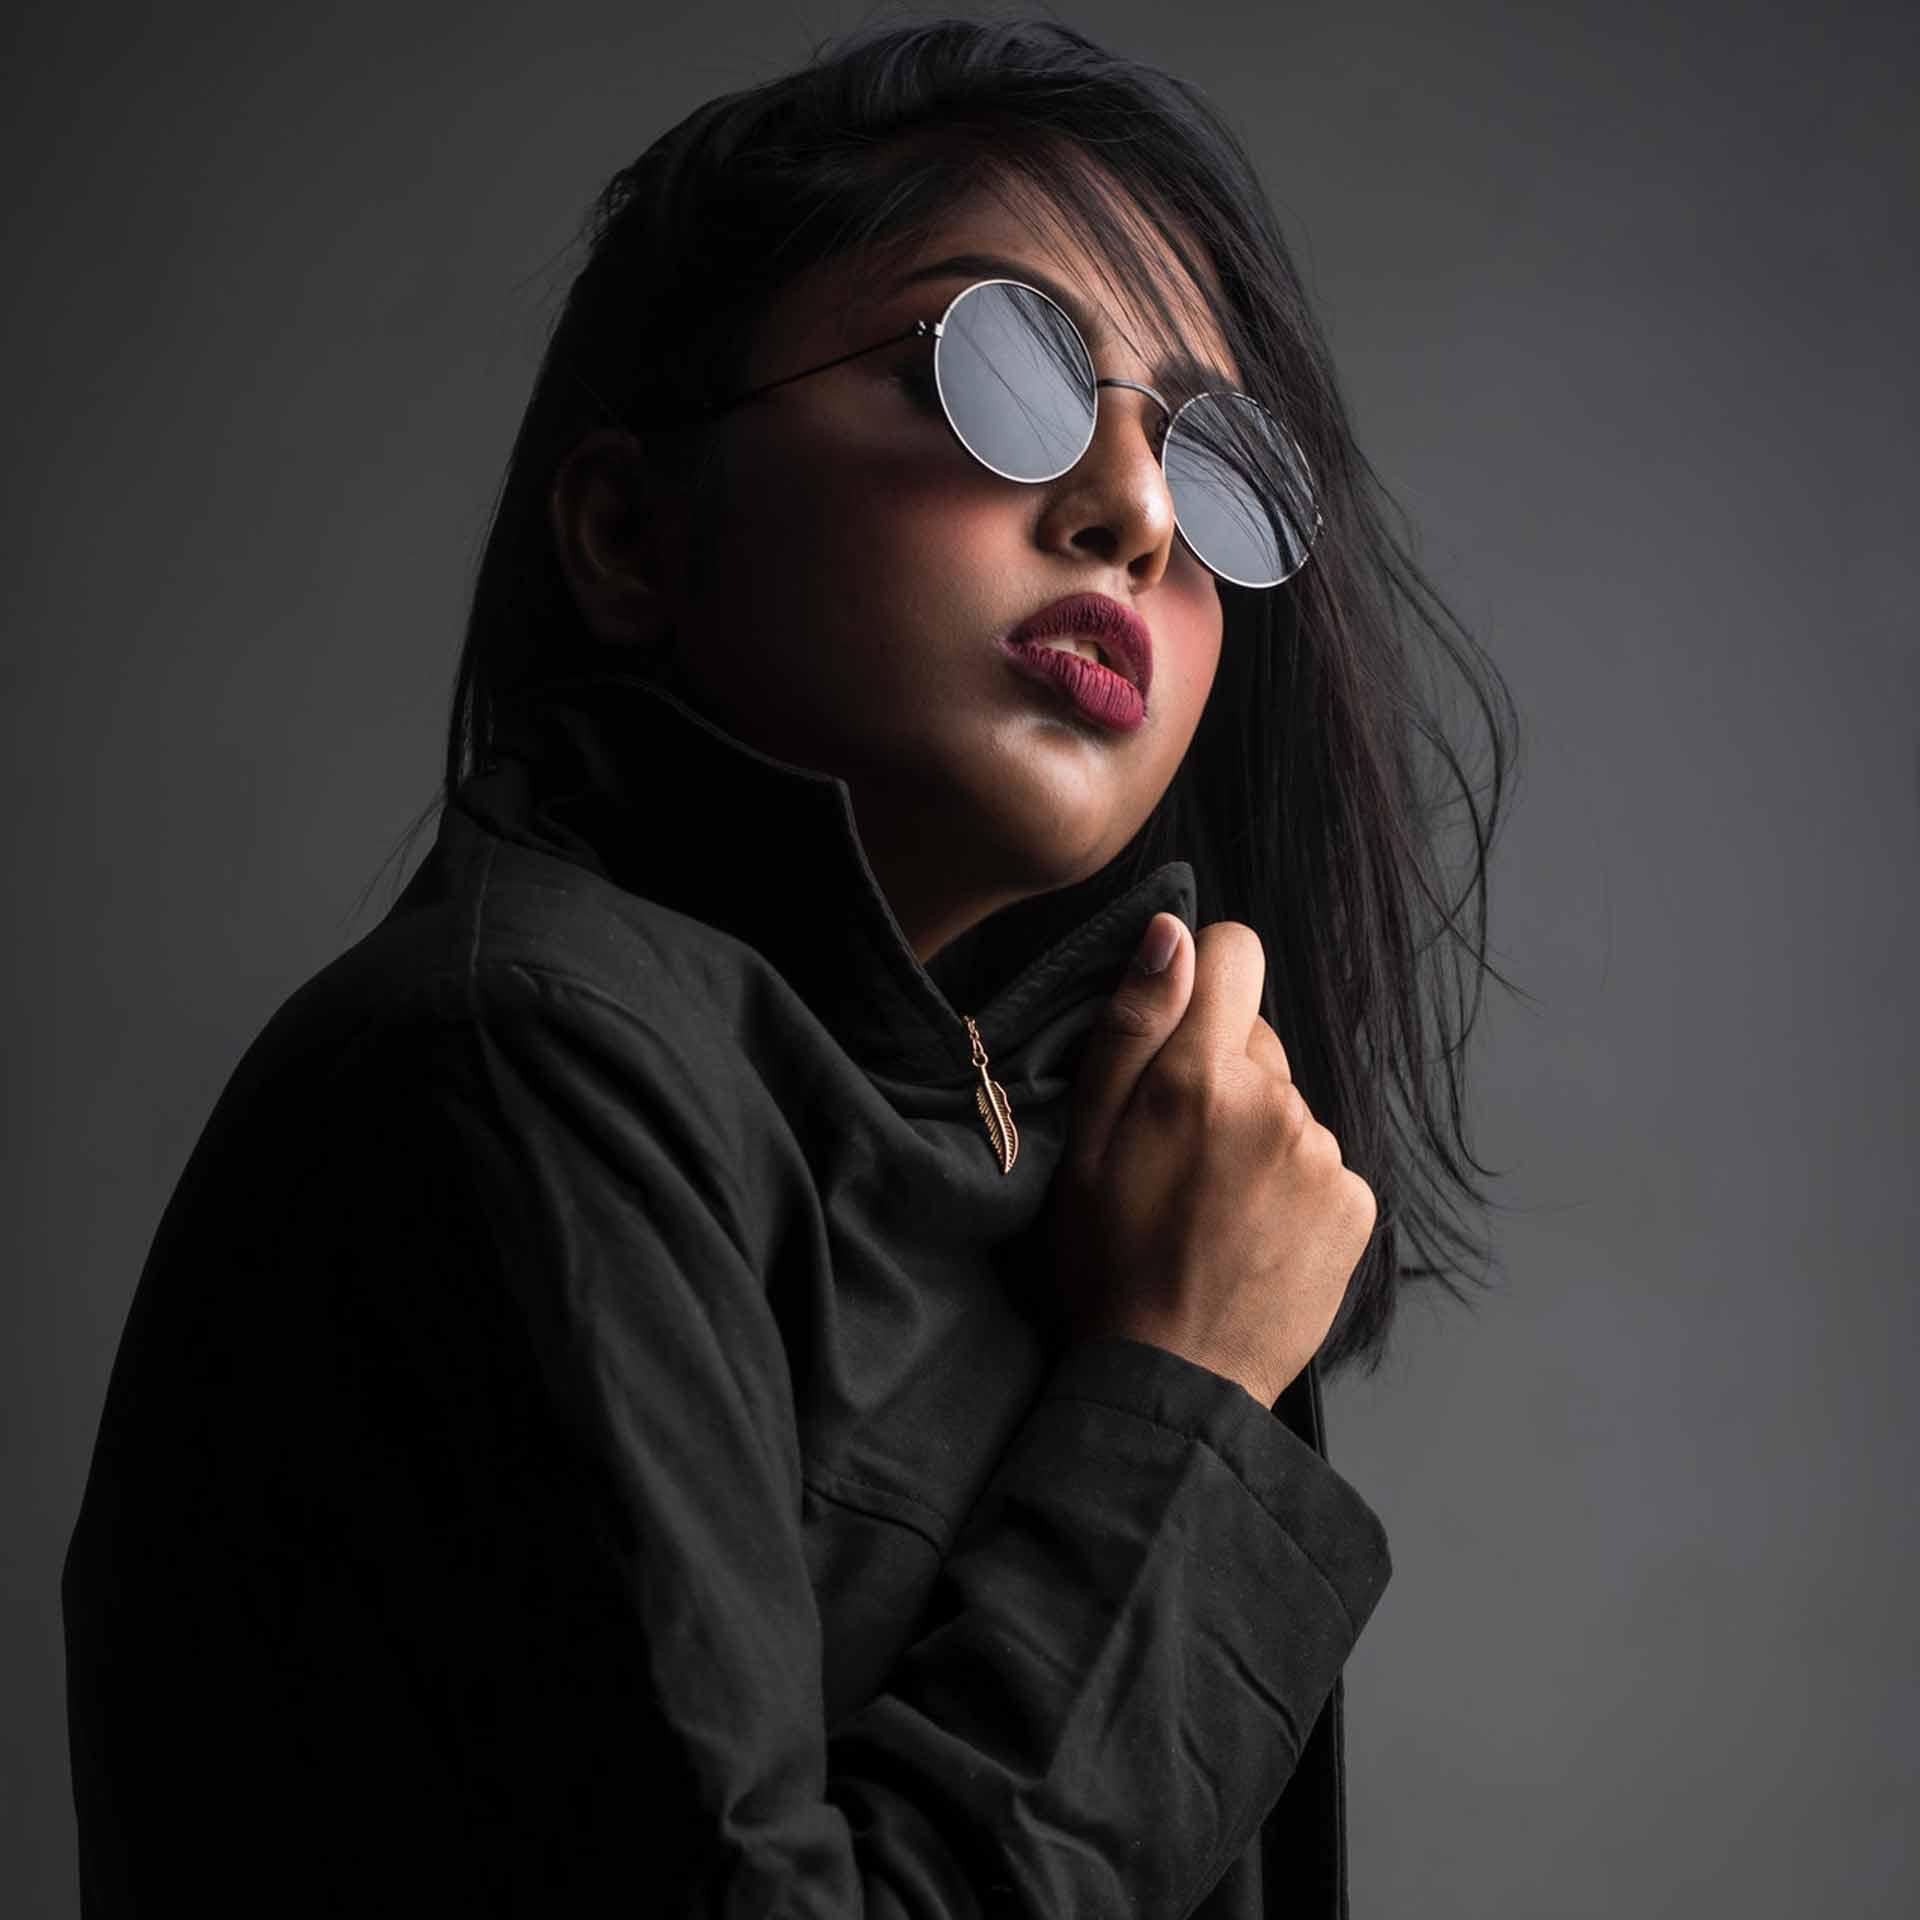 woman-posing-for-photo-shoot-1689731